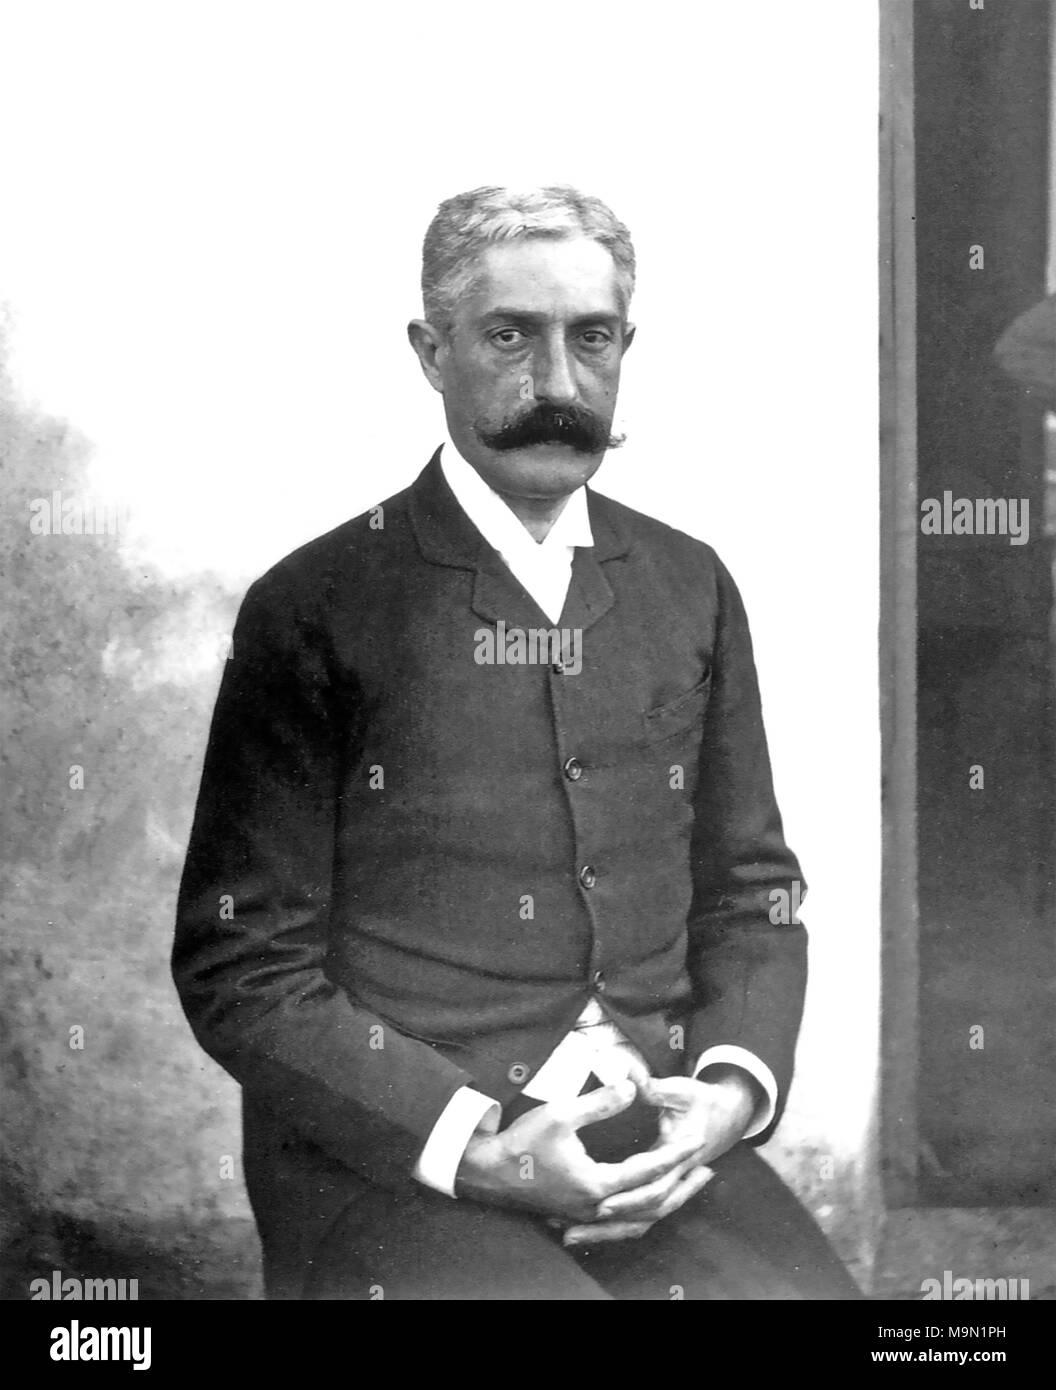 GIOVANNI VERGA (1840-1922) Italian writer and novelist about 1920 - Stock Image